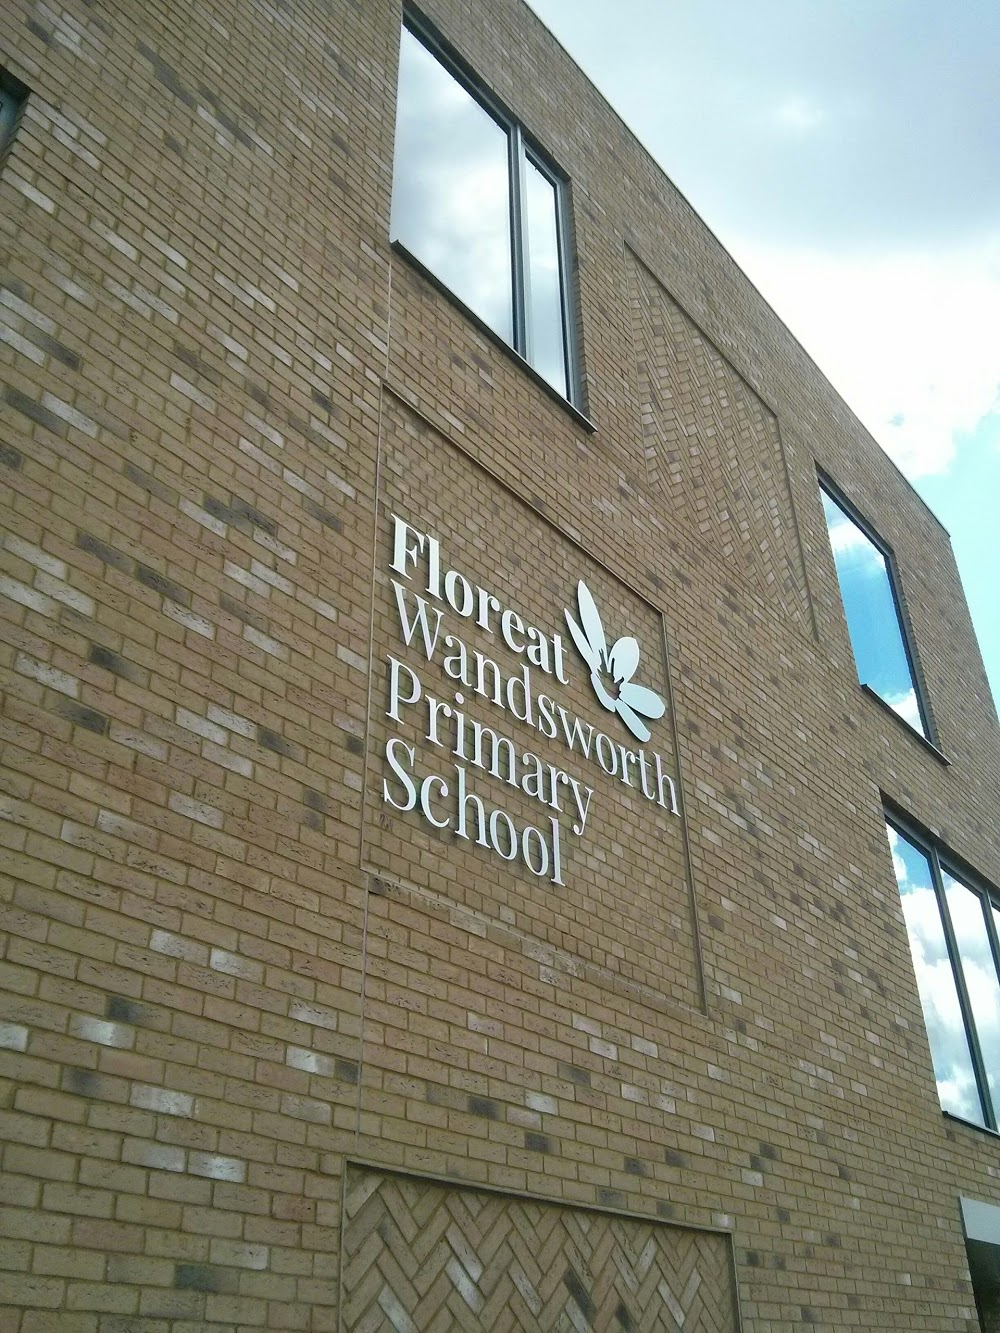 Floreat Wandsworth Primary School